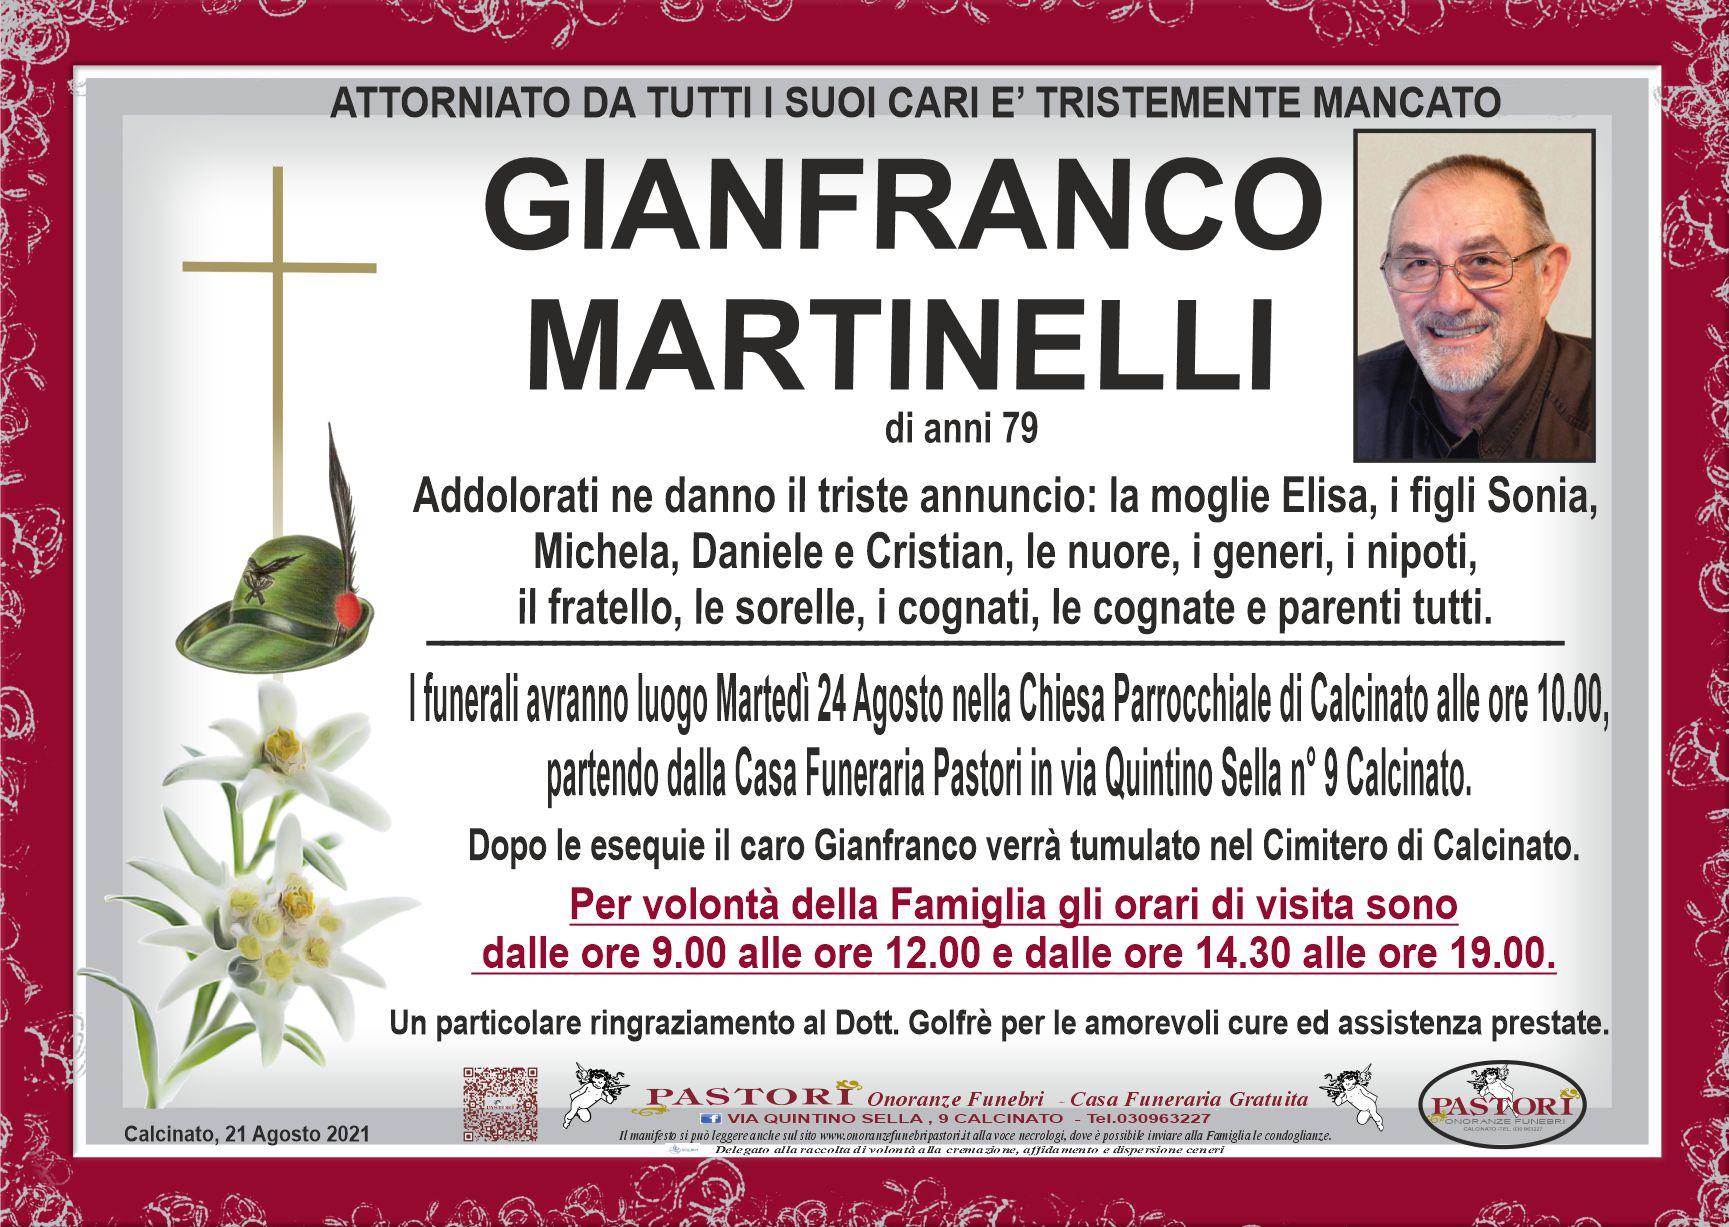 Gianfranco Martinelli